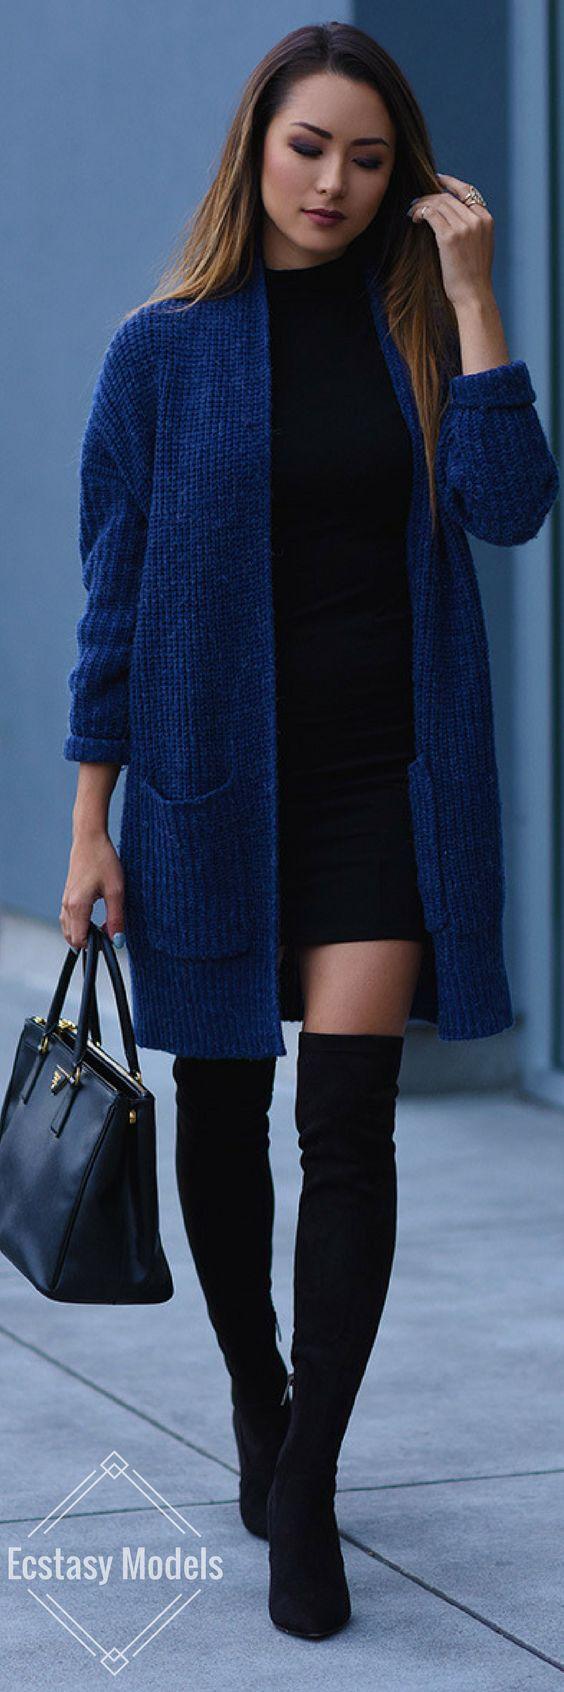 Cozy Blue Cardigan // Fashion Look by Hapatime